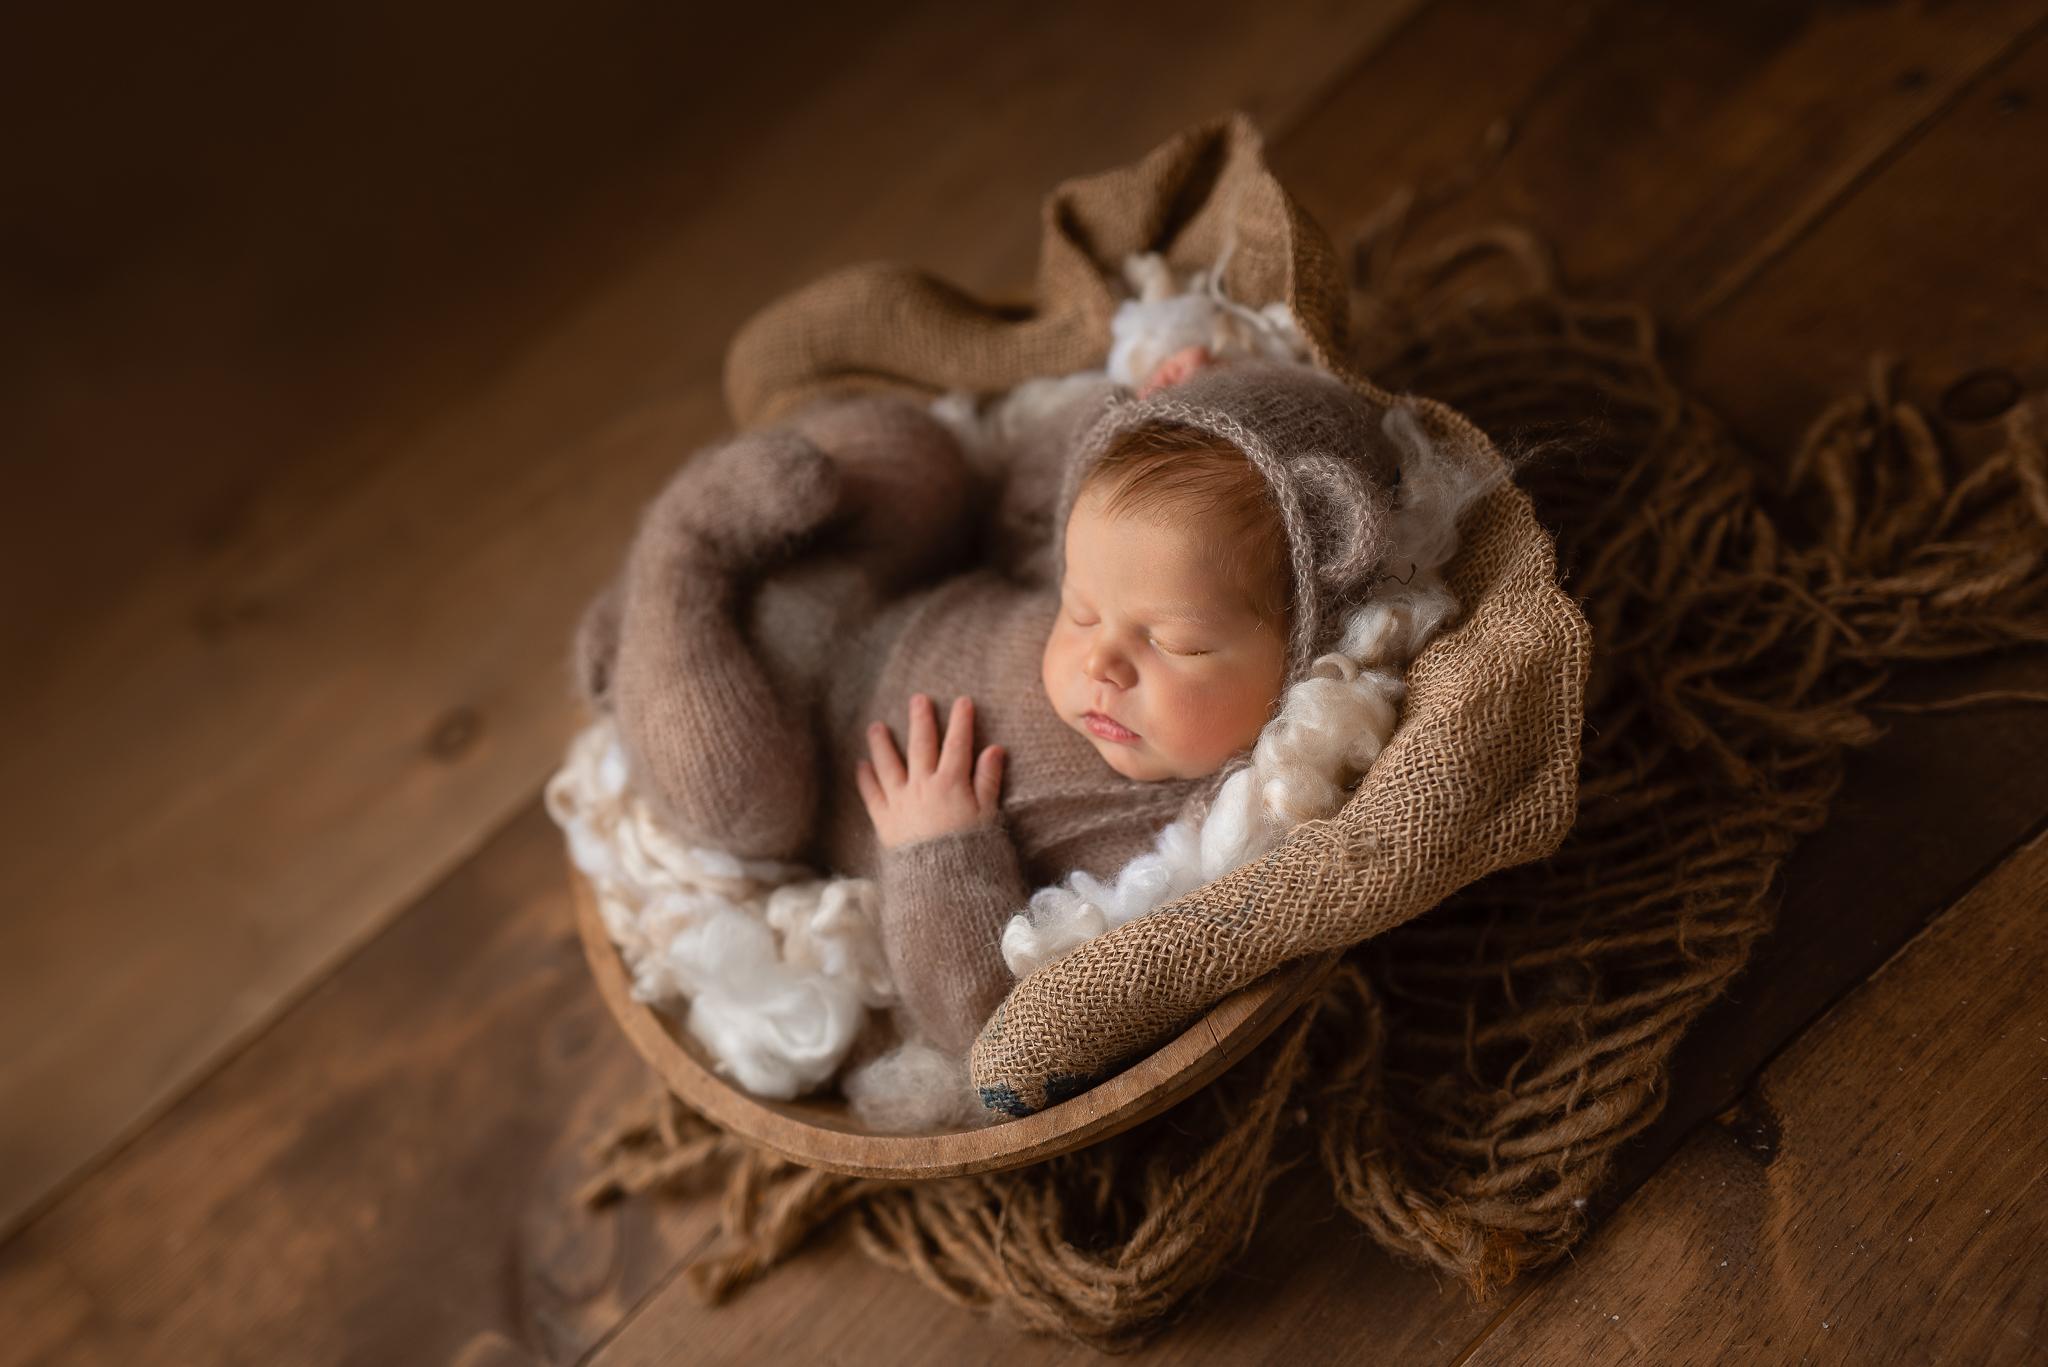 Newborn197NaomiLuciennePhotography062019-2-Edit-2.jpg